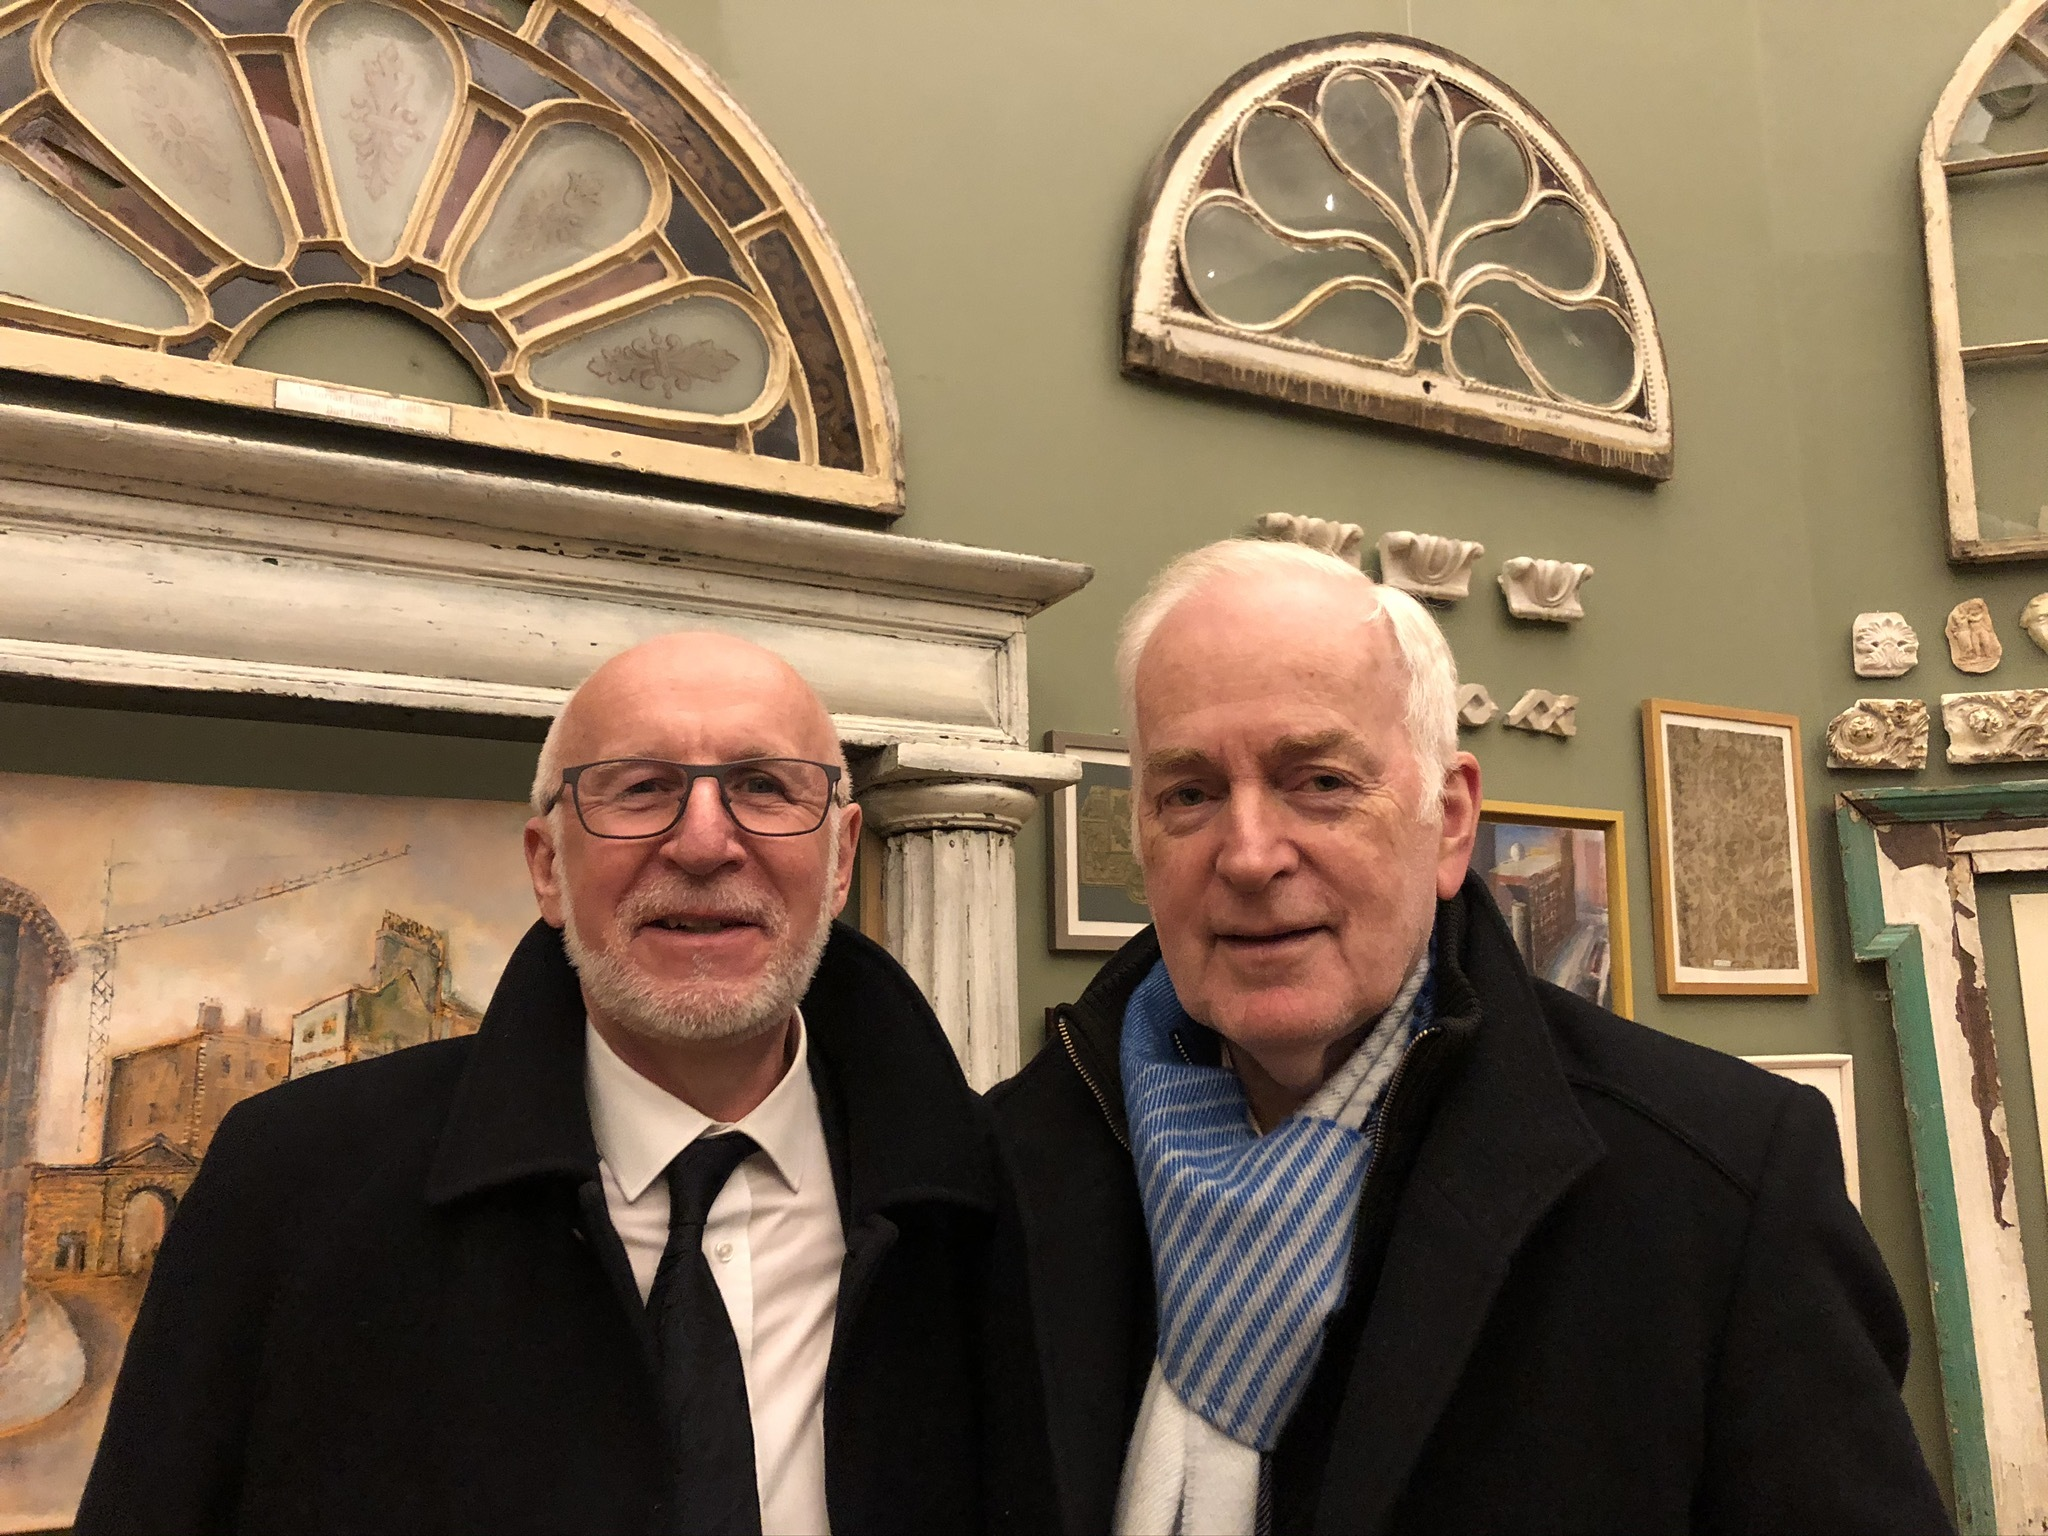 OPW-Commissioner-John-McMahon-and-David-Sheehan.JPEG#asset:13506